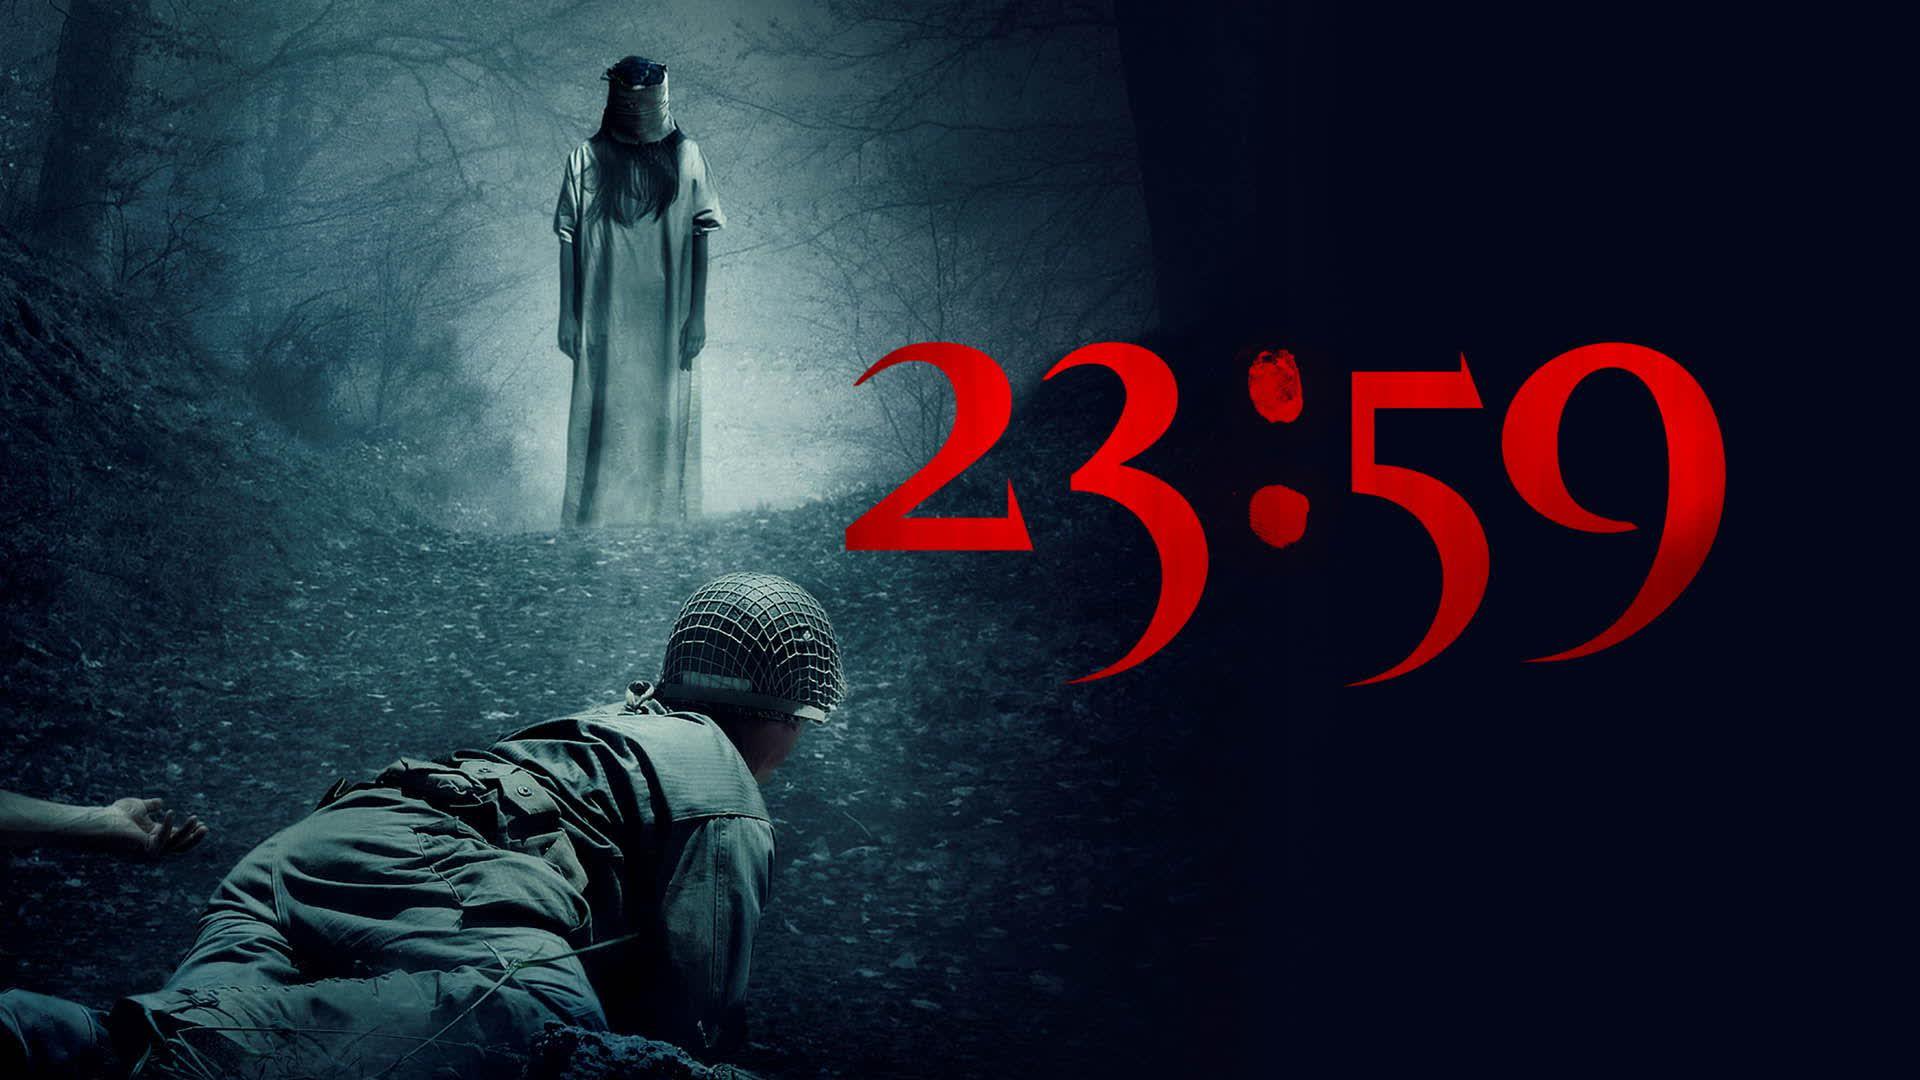 23:59:00